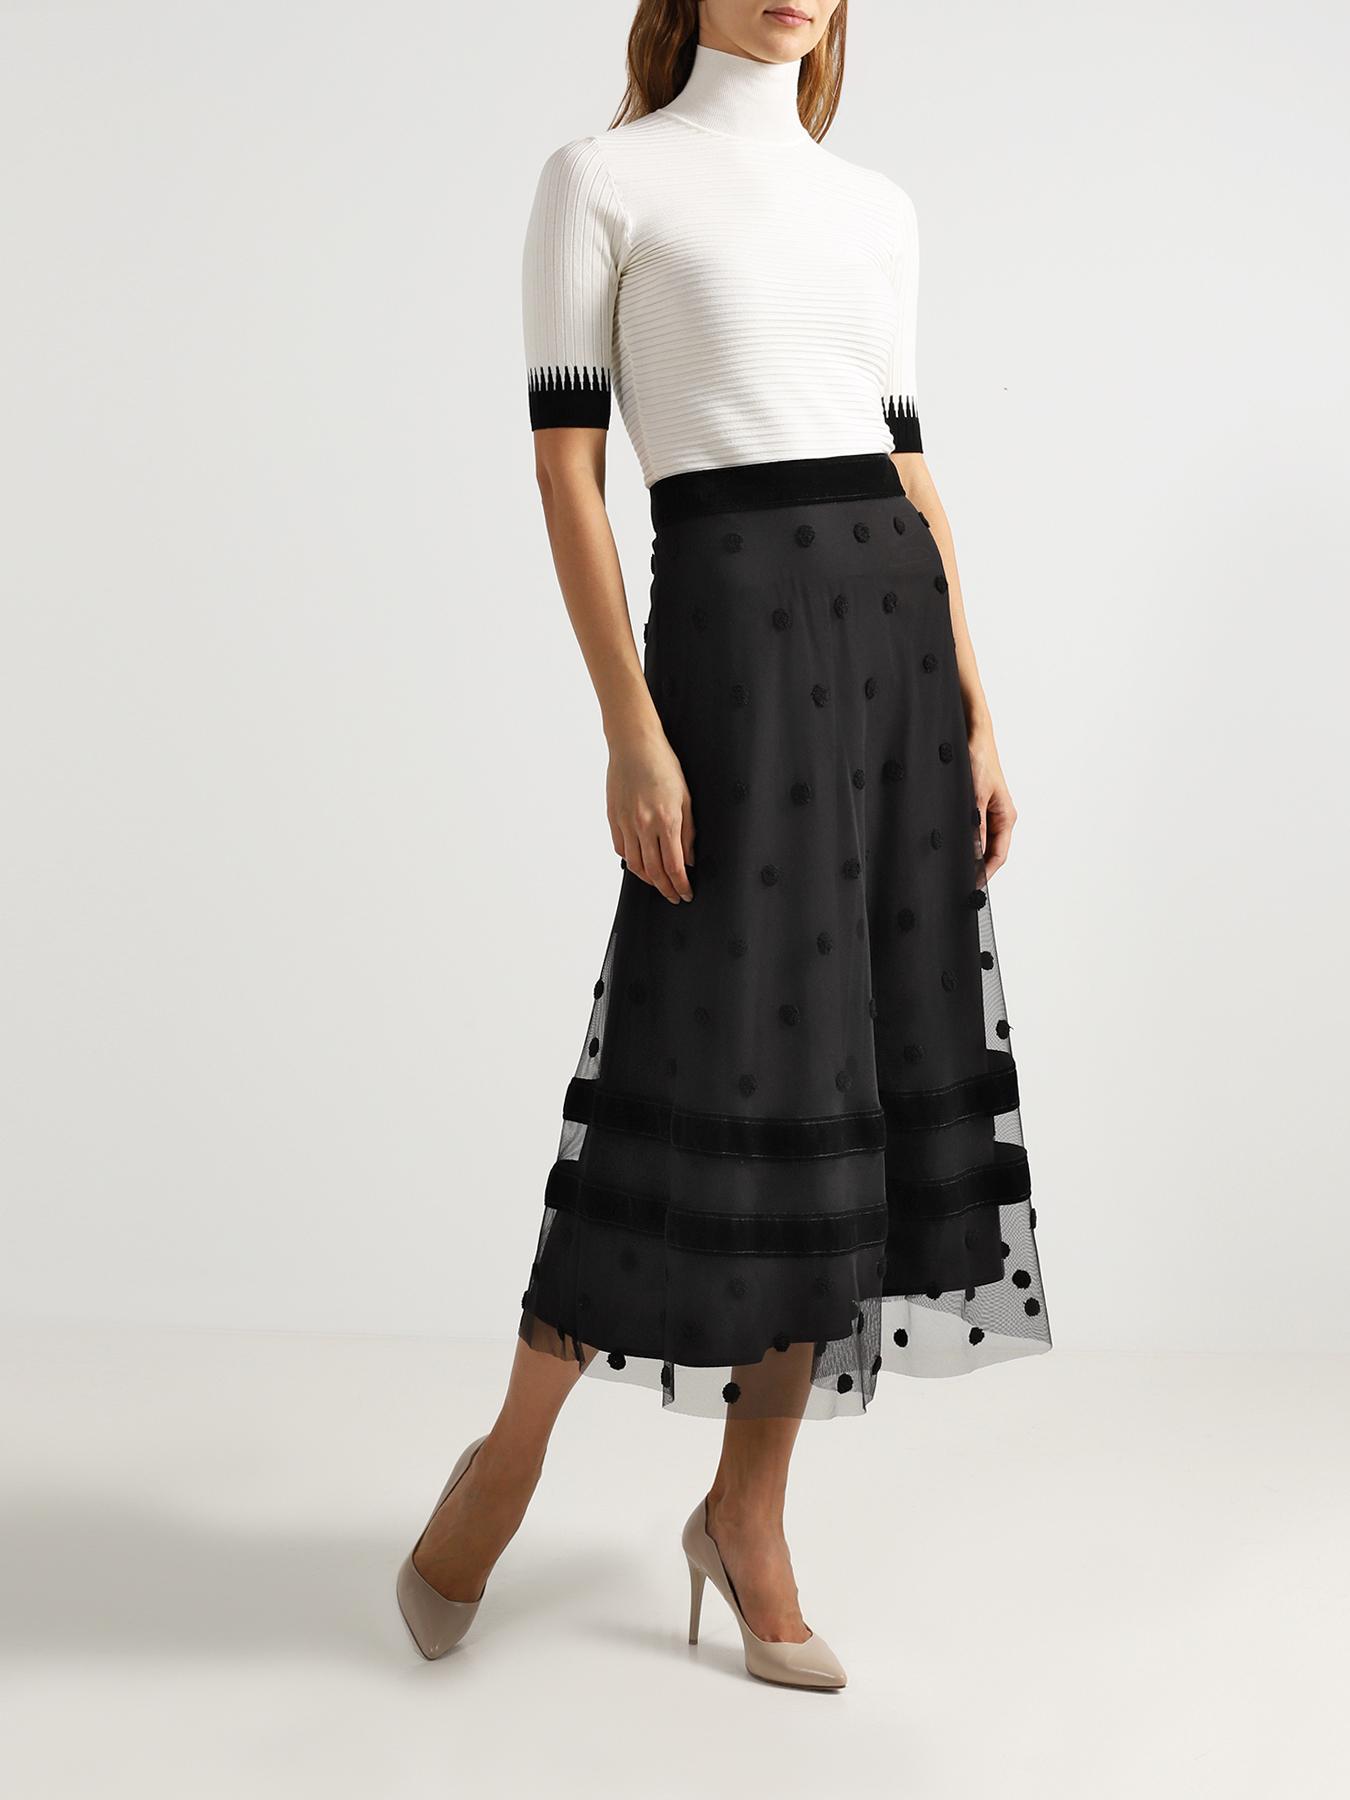 Pennyblack Женская юбка фото